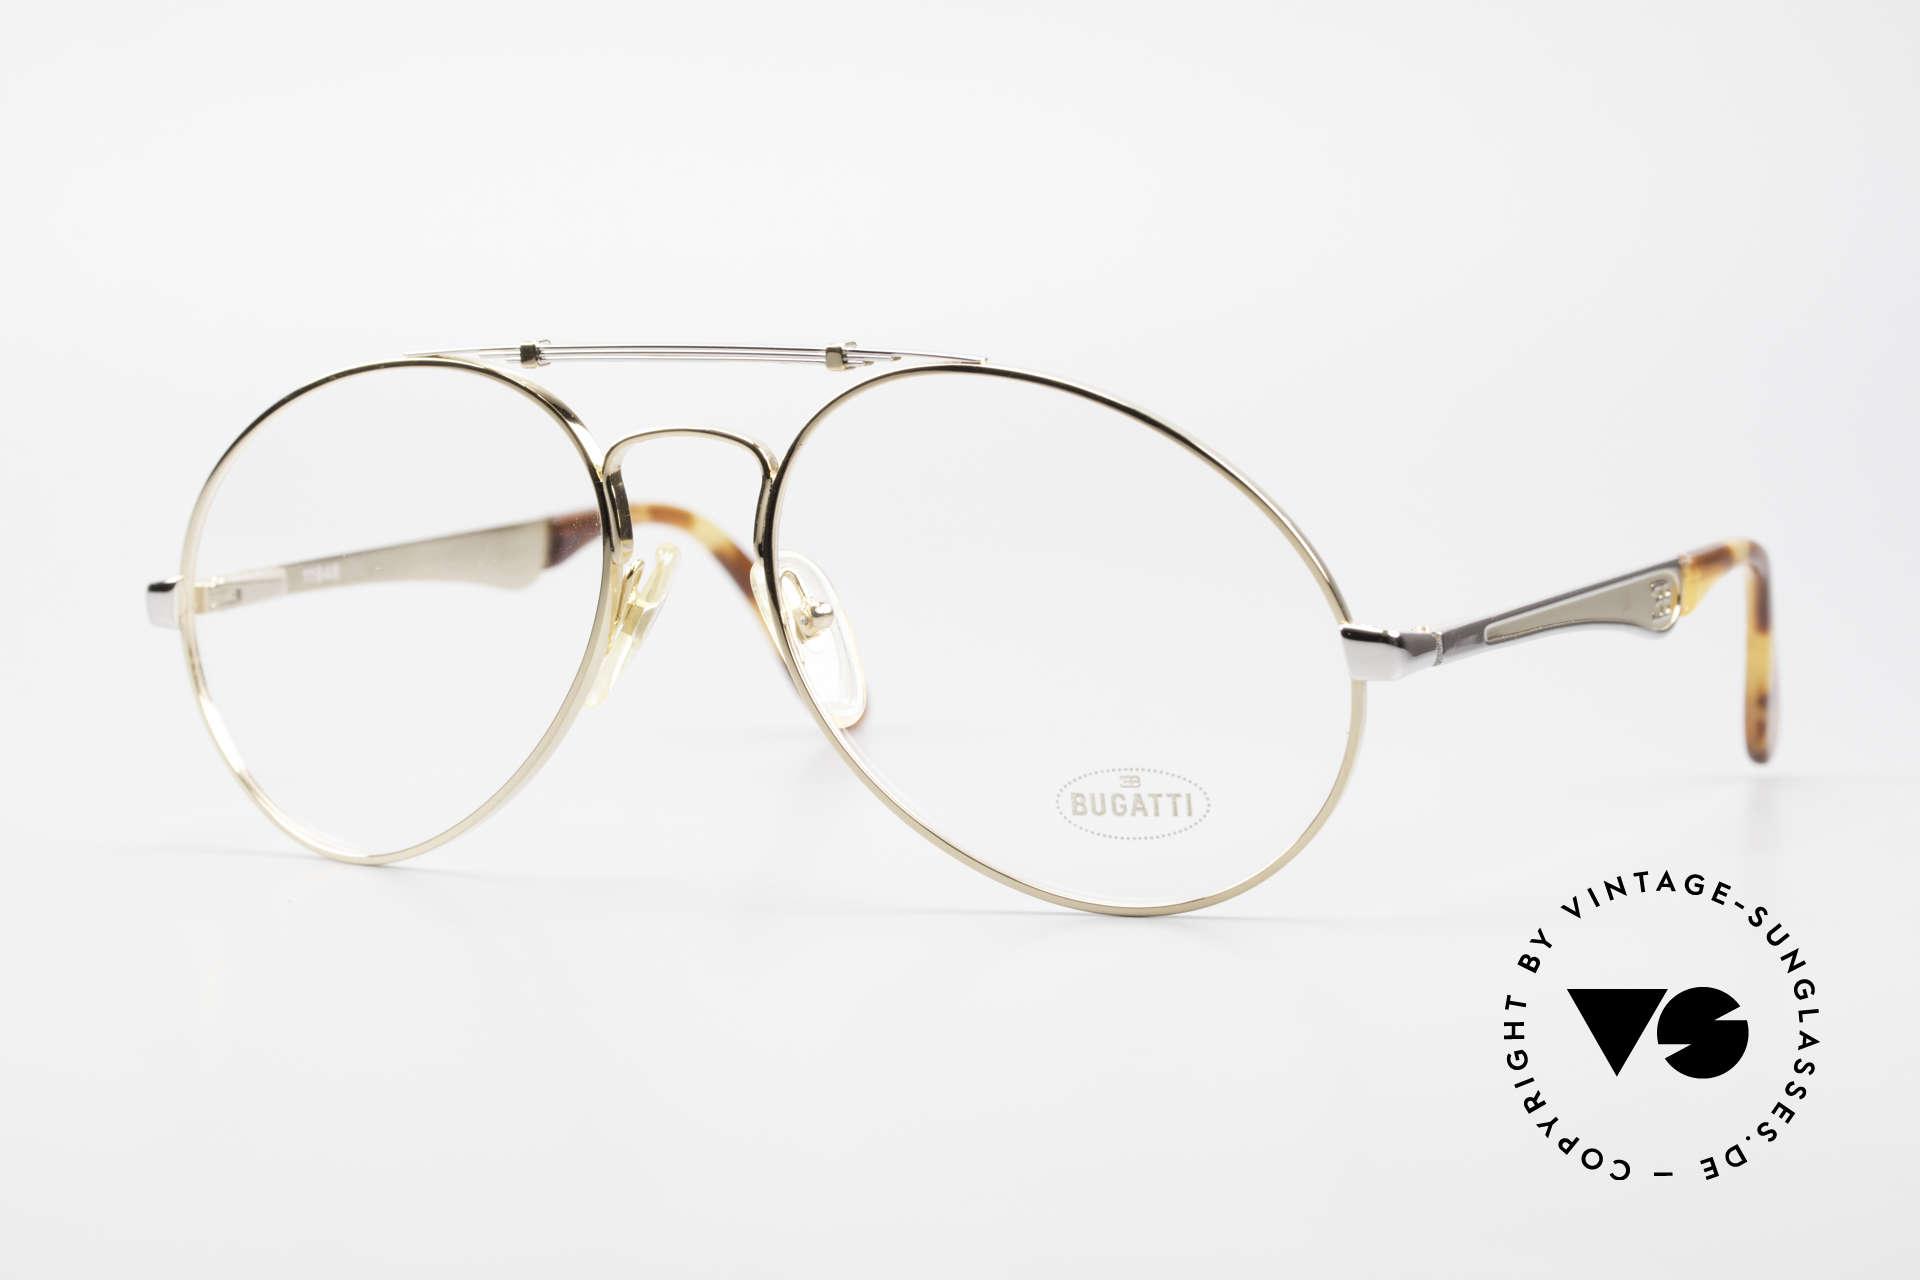 Bugatti 11948 Gold Plated Luxury Frame XL, vintage 80's men's eyeglass-frame in size 58/20, Made for Men